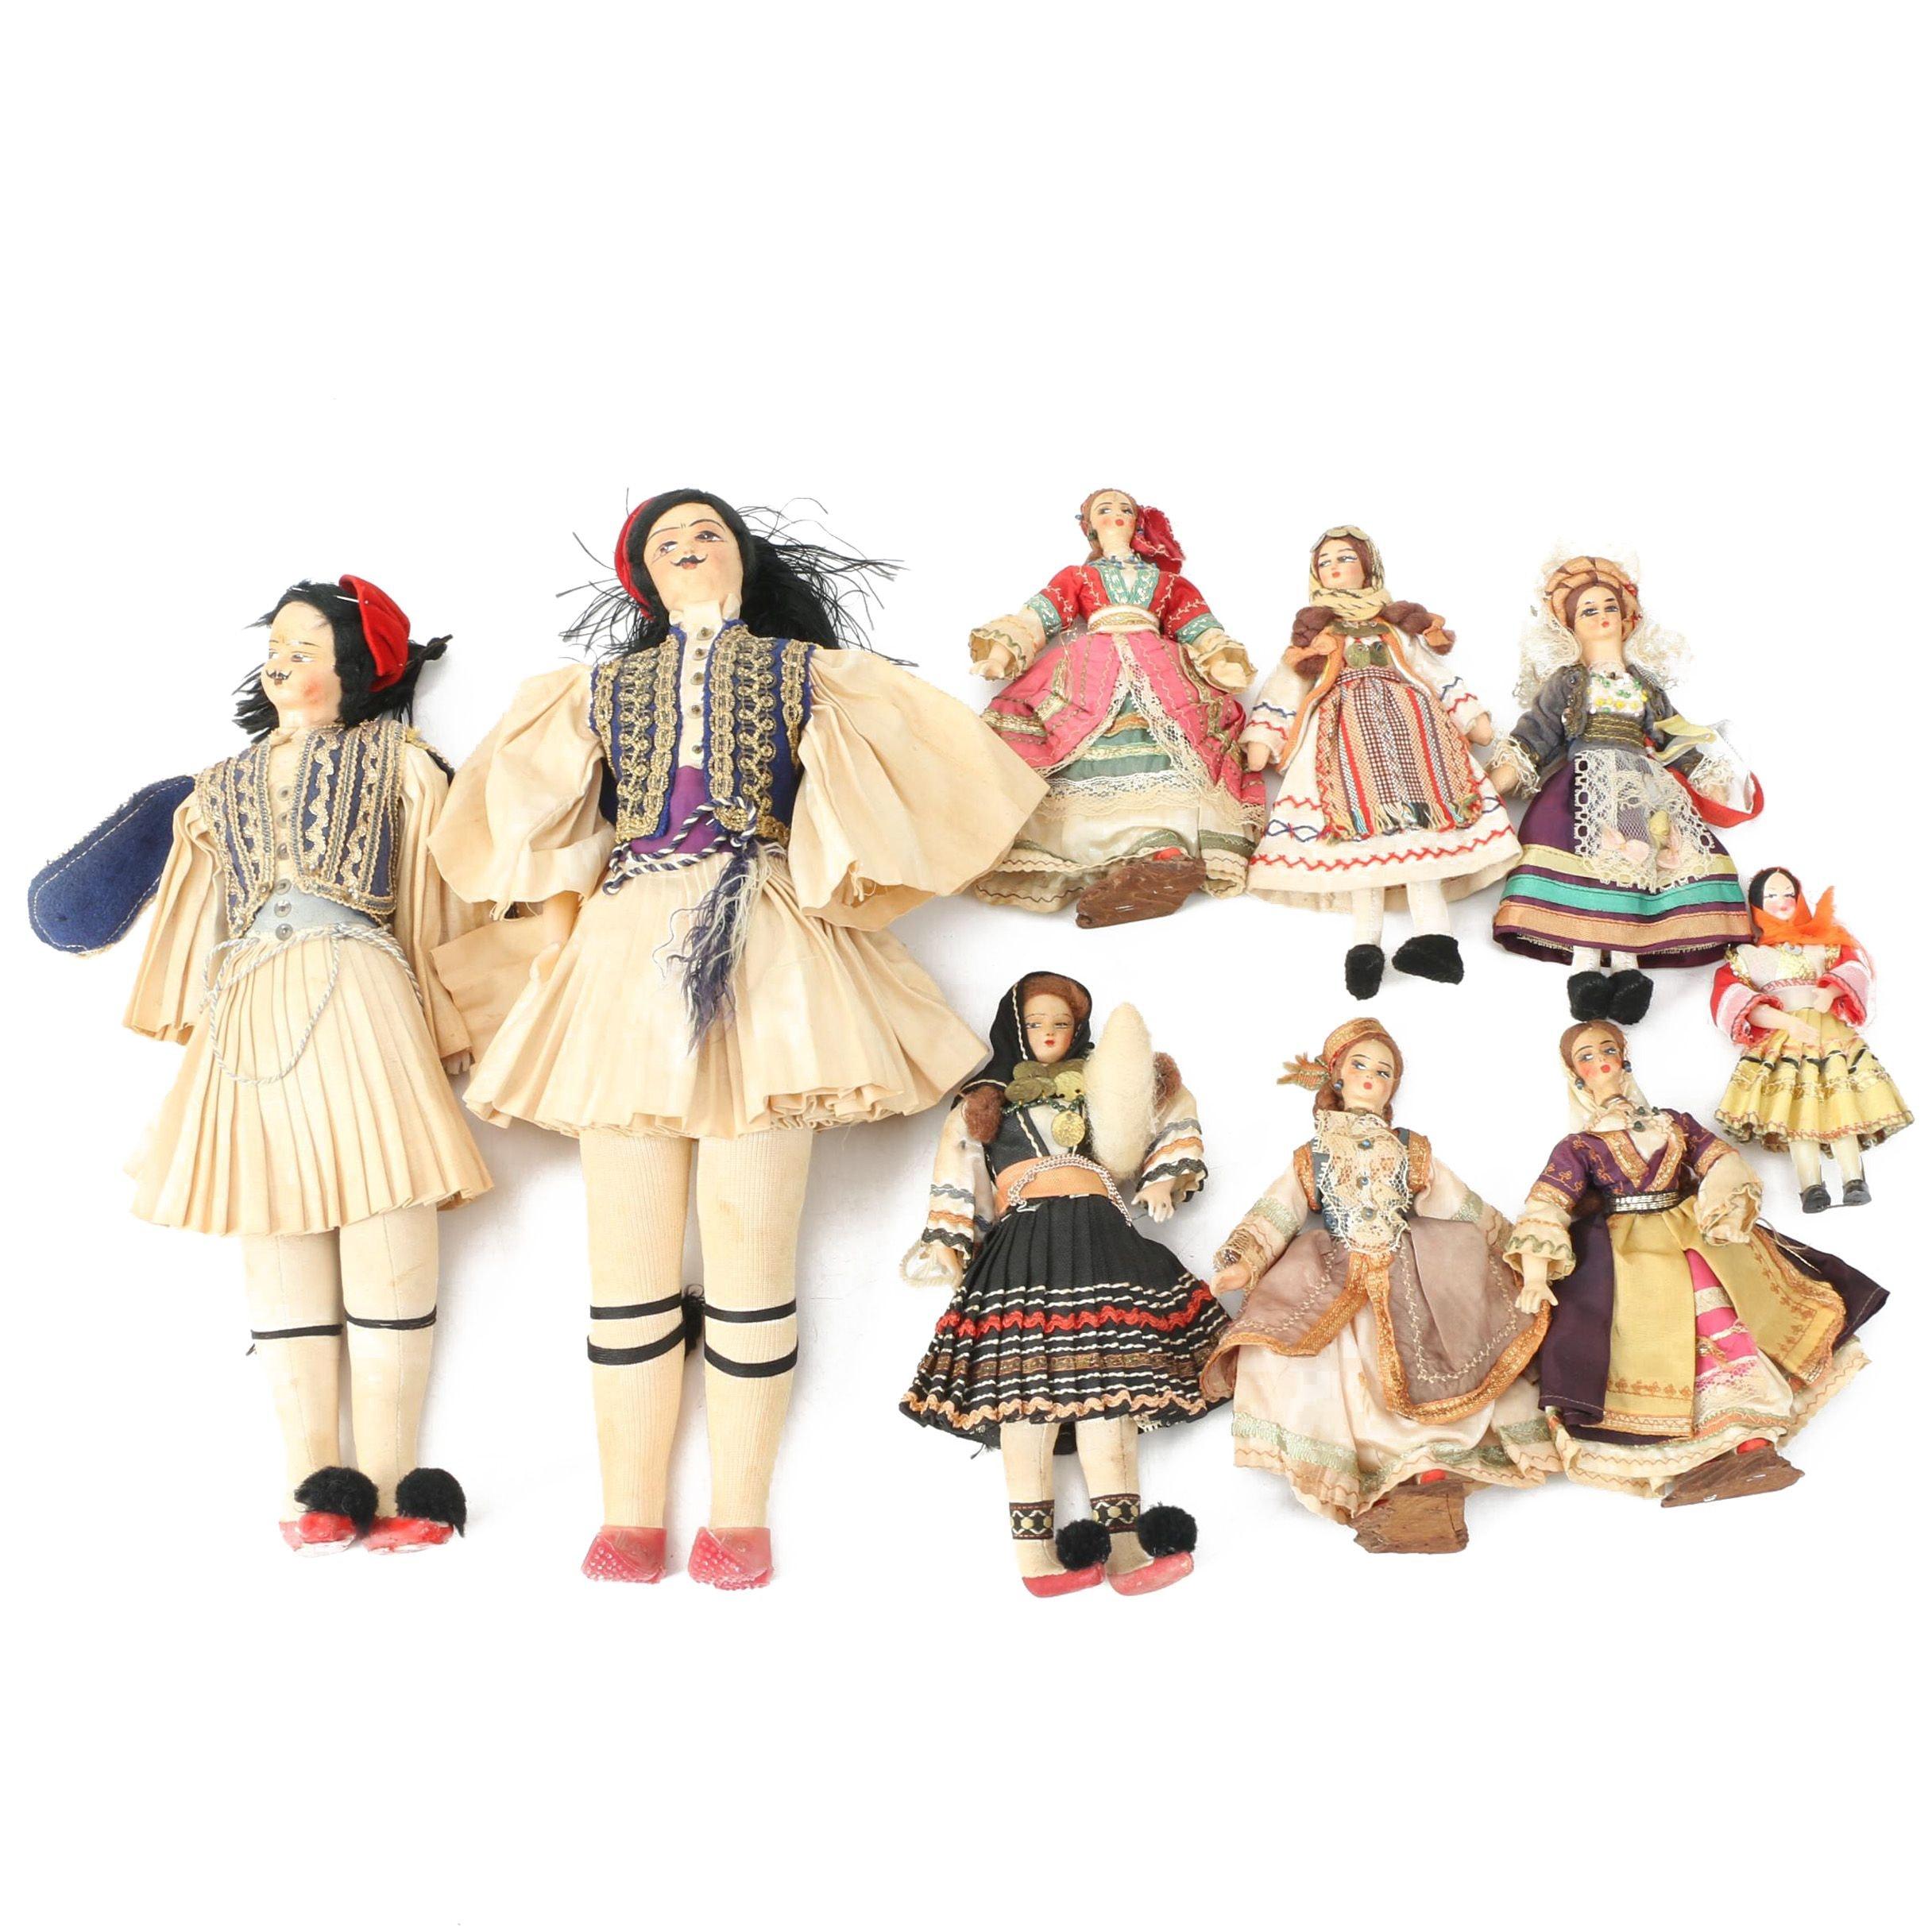 Romanian Cloth and Wood Folk Art Dolls